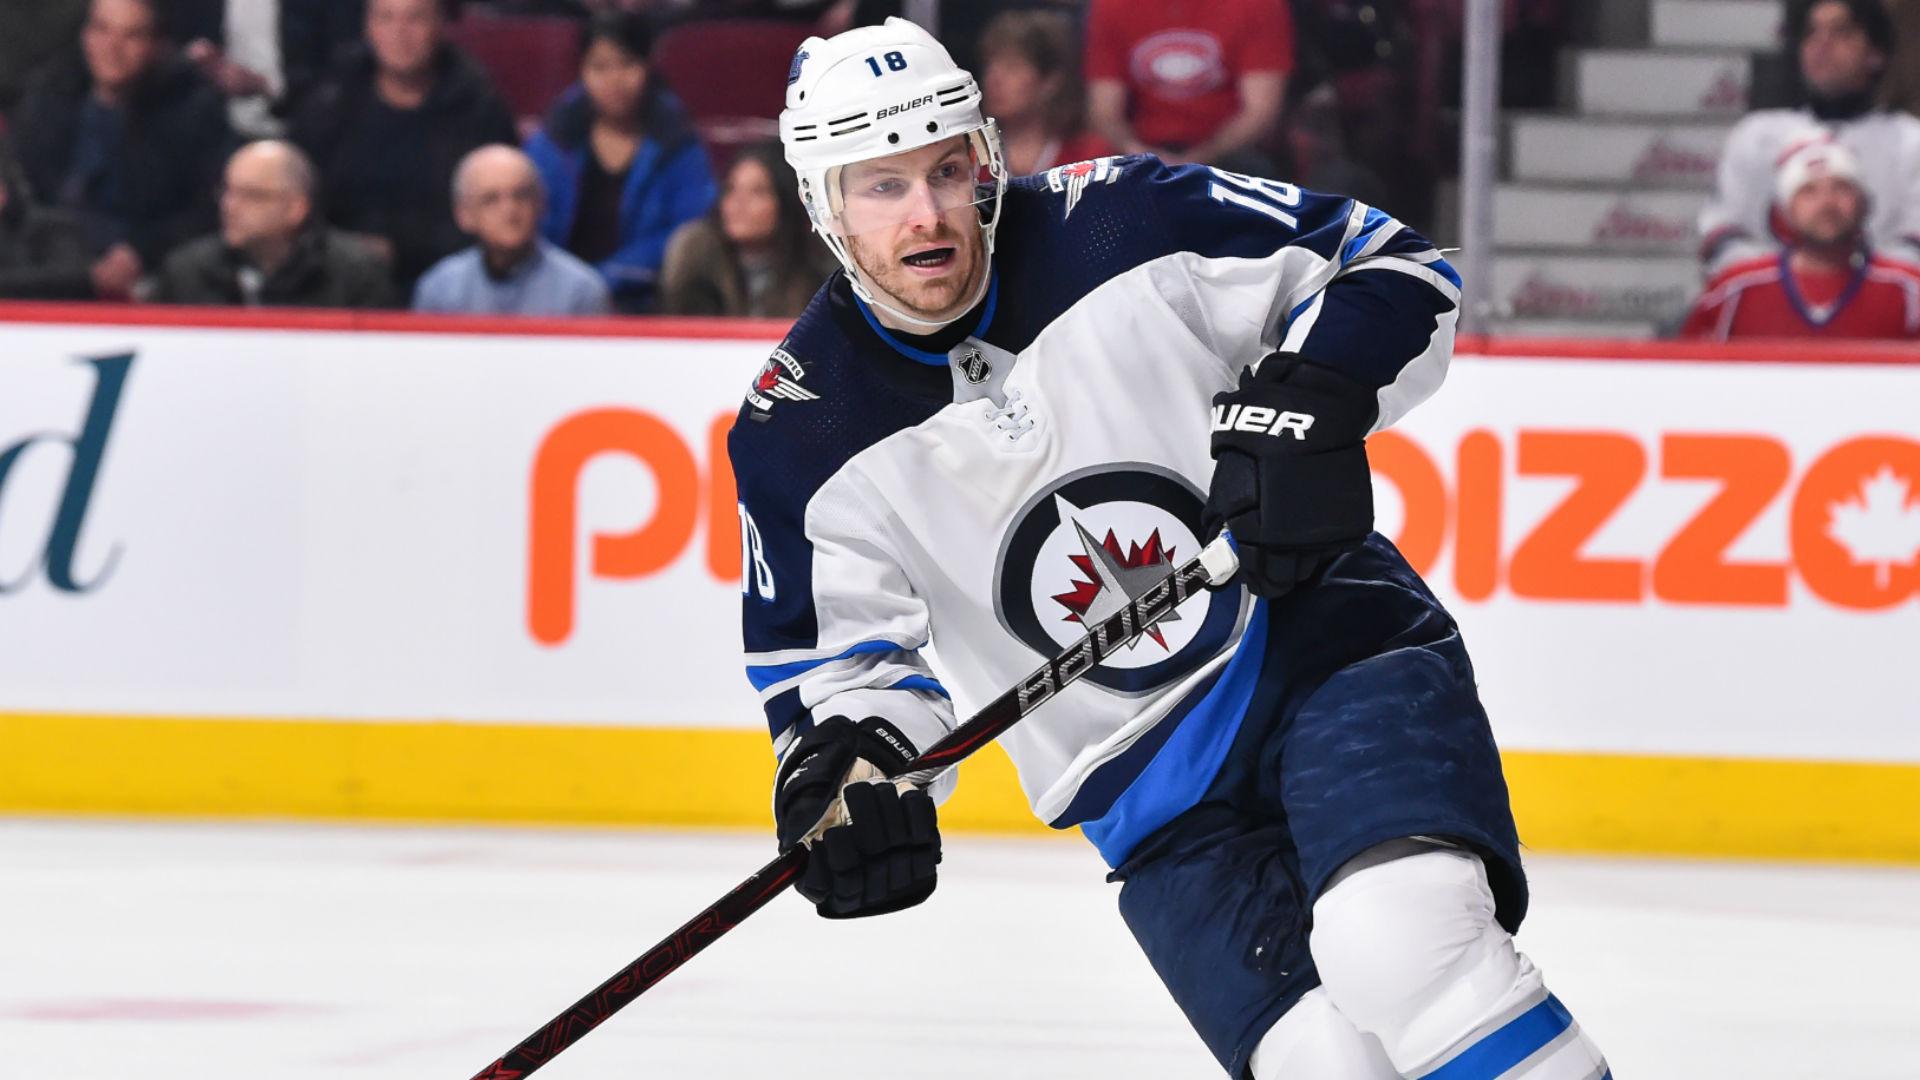 Bryan Little Injury Update Winnipeg Jets Forward In Good Spirits After Taking Puck To Head Sporting News Canada